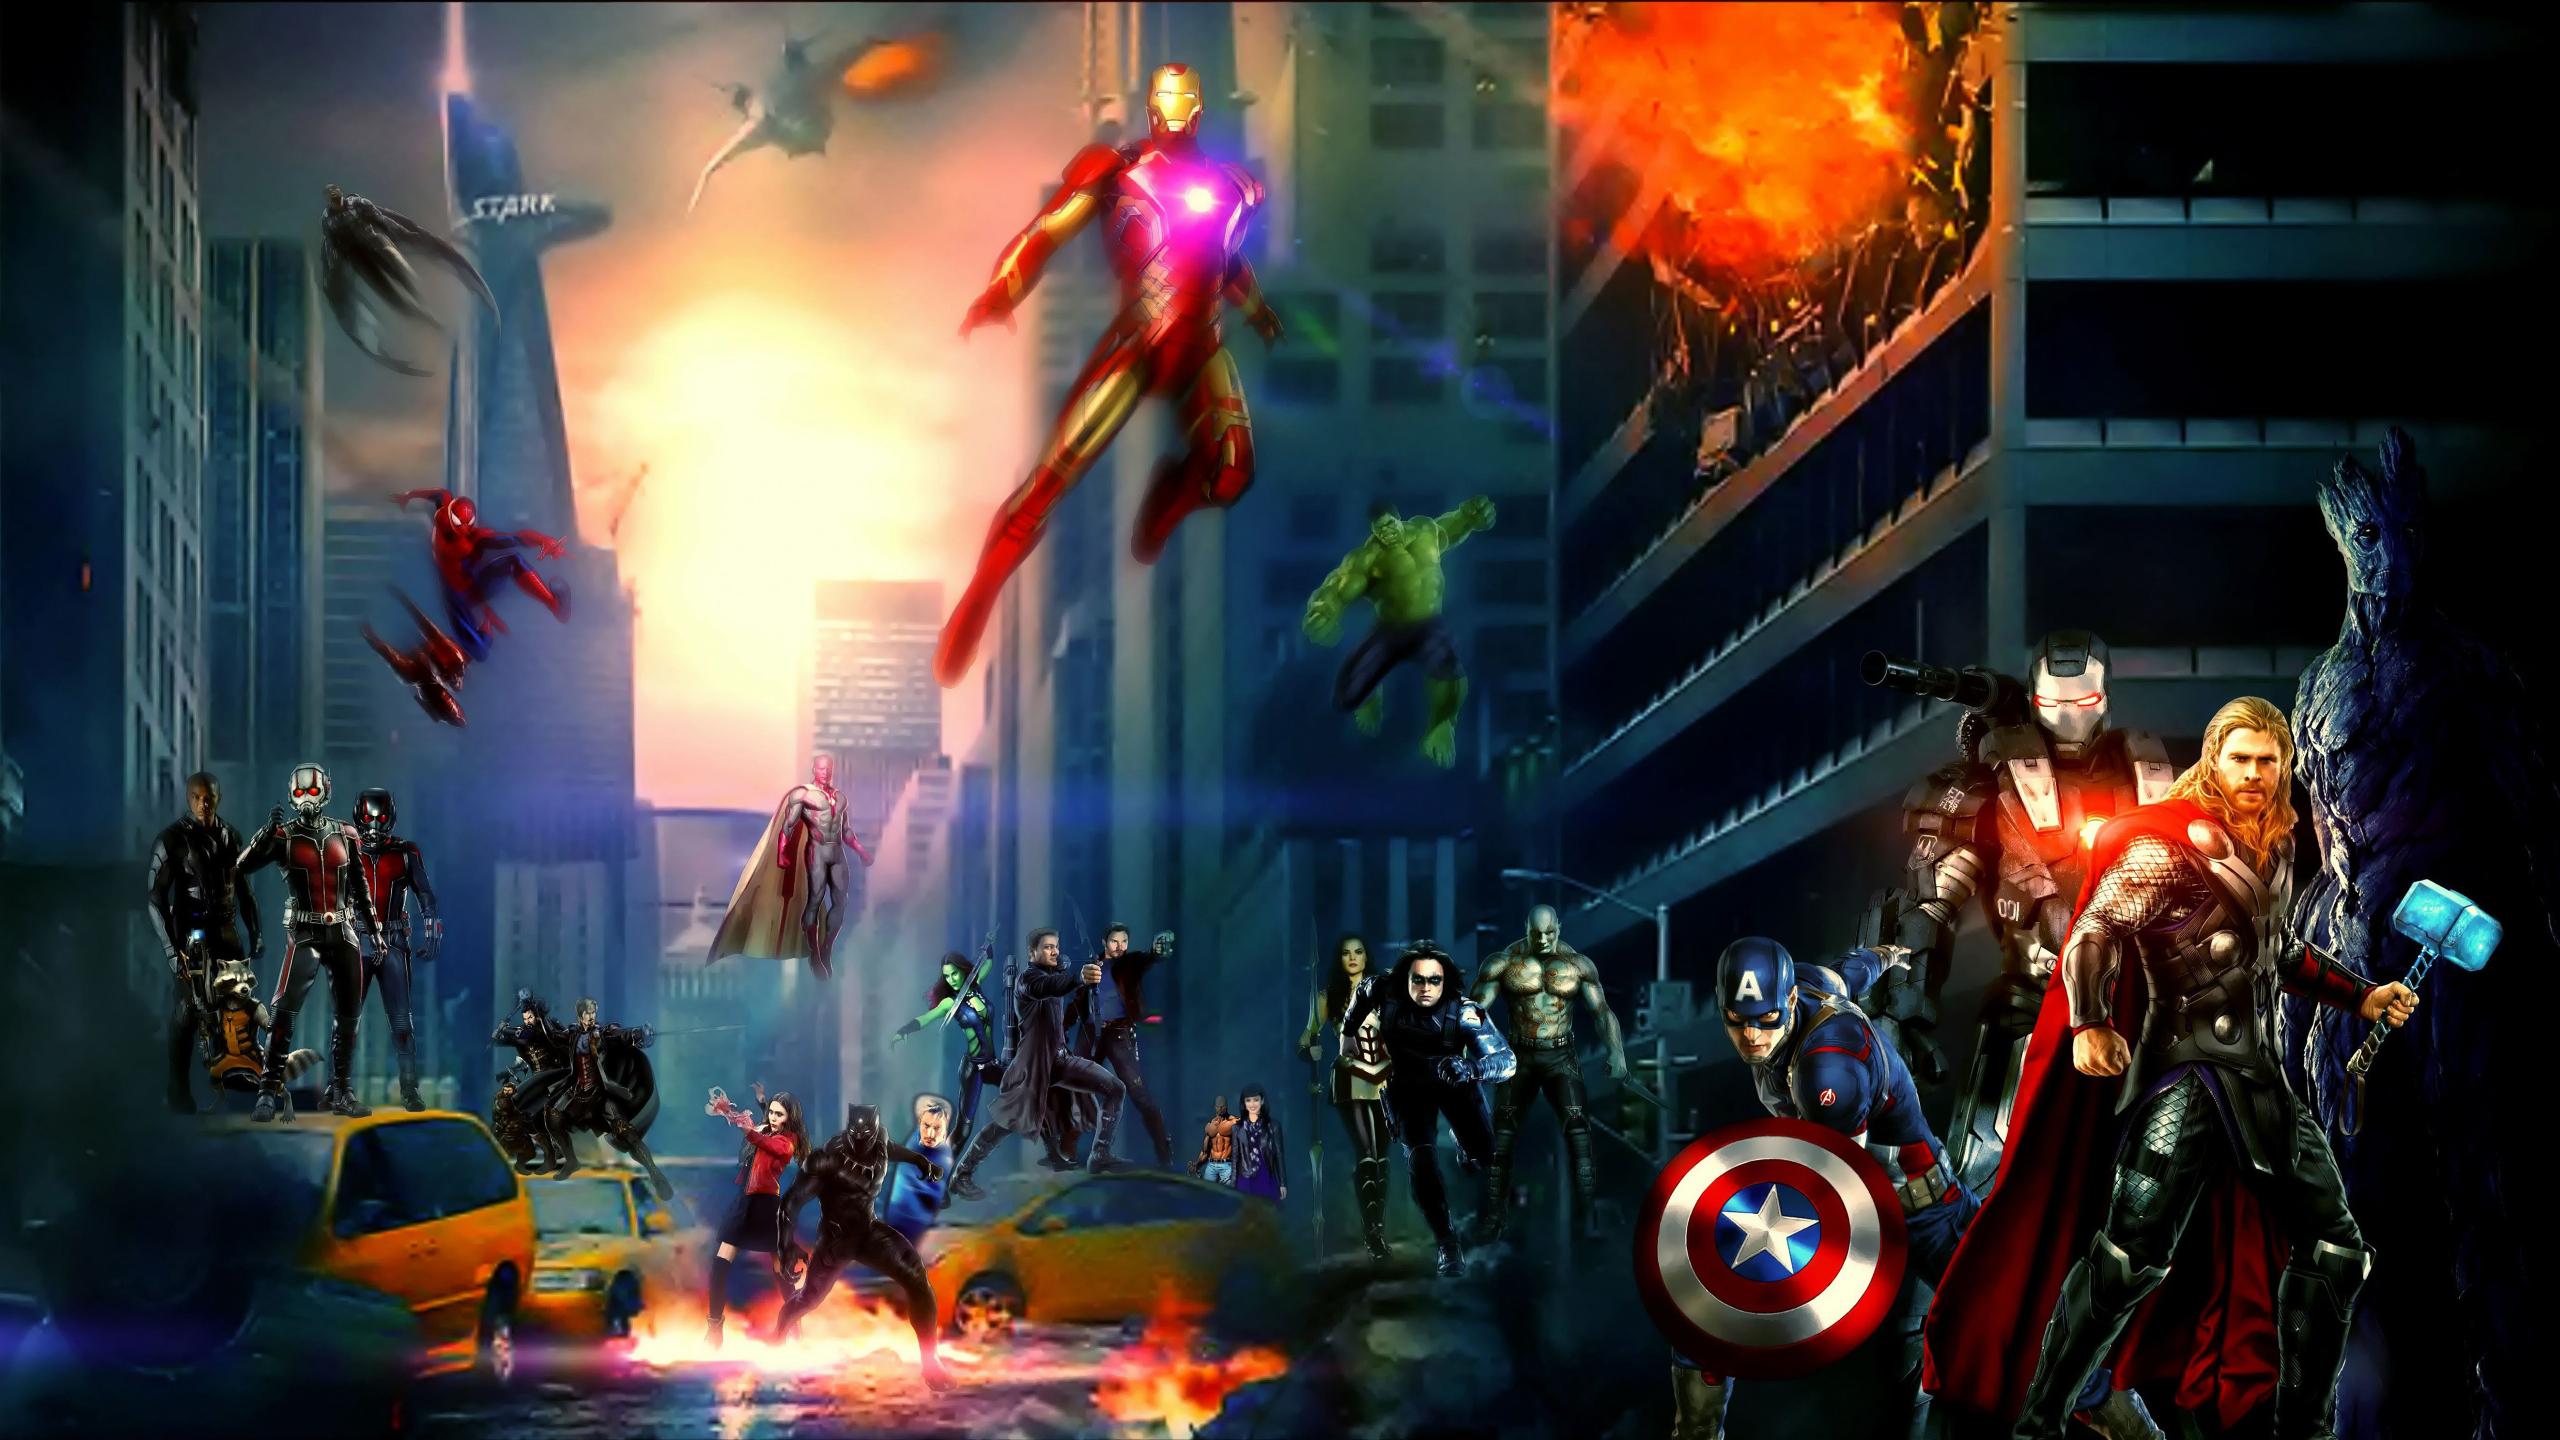 Download Marvel Cinematic Universe Superhero Artwork